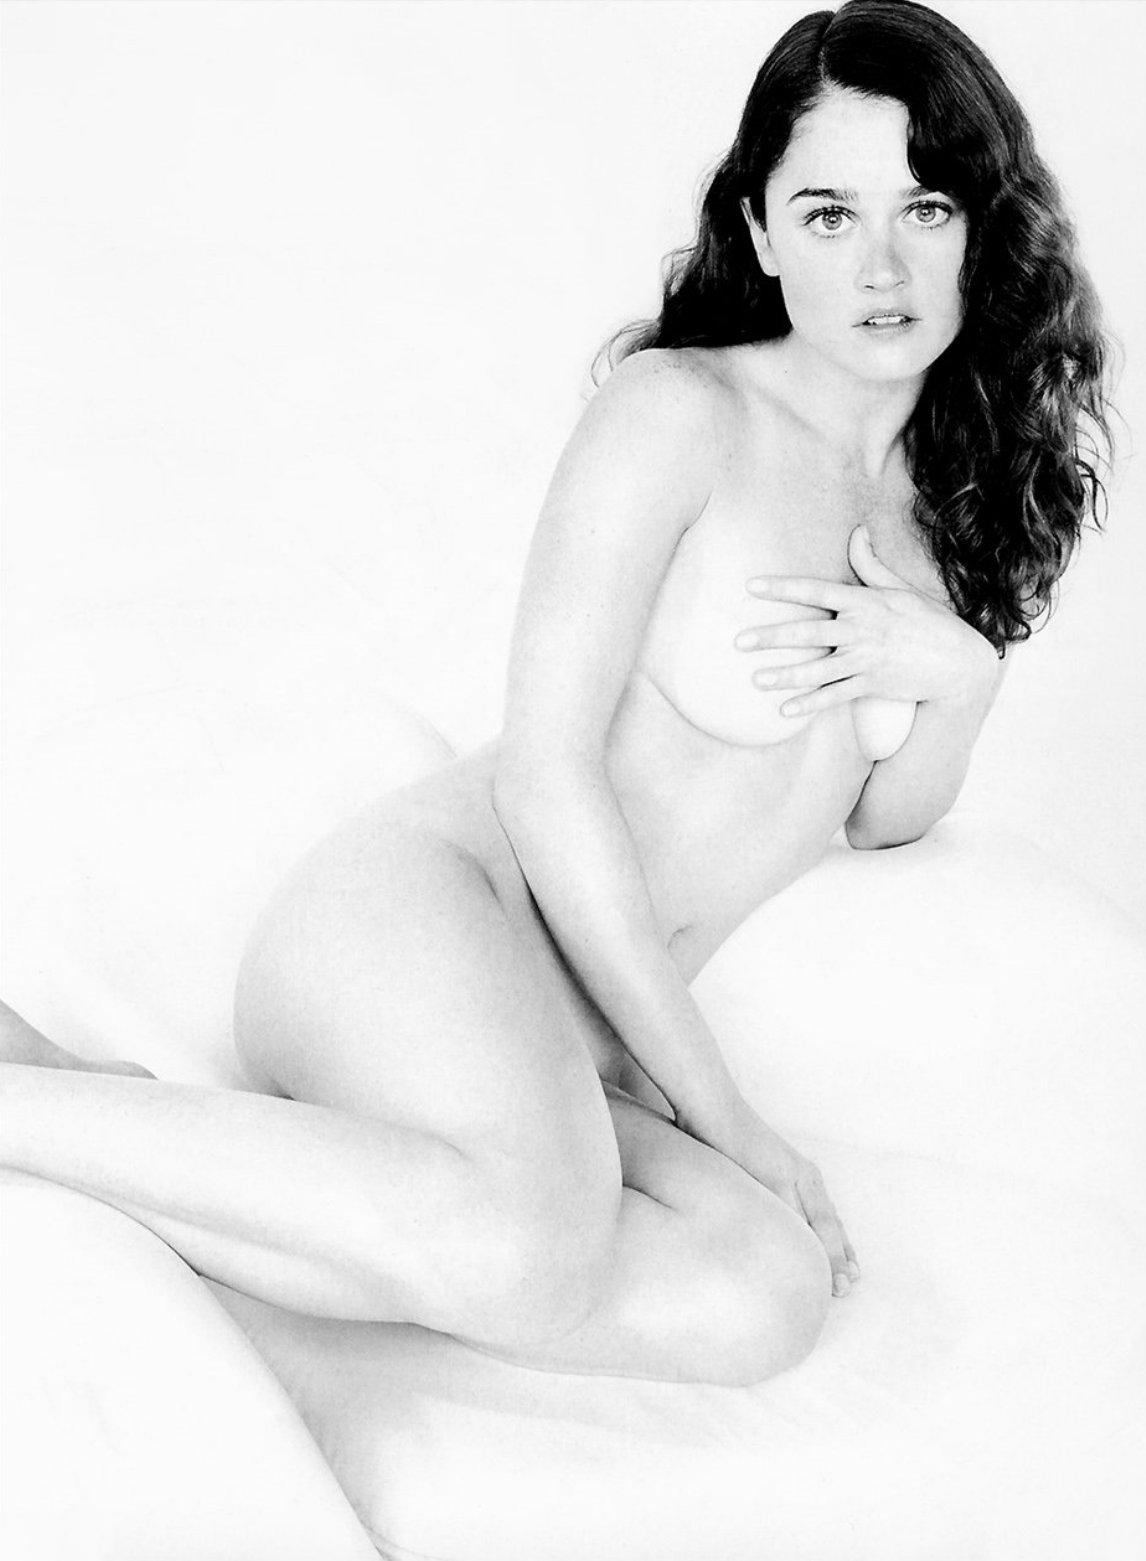 Robin Tunney Nude 1